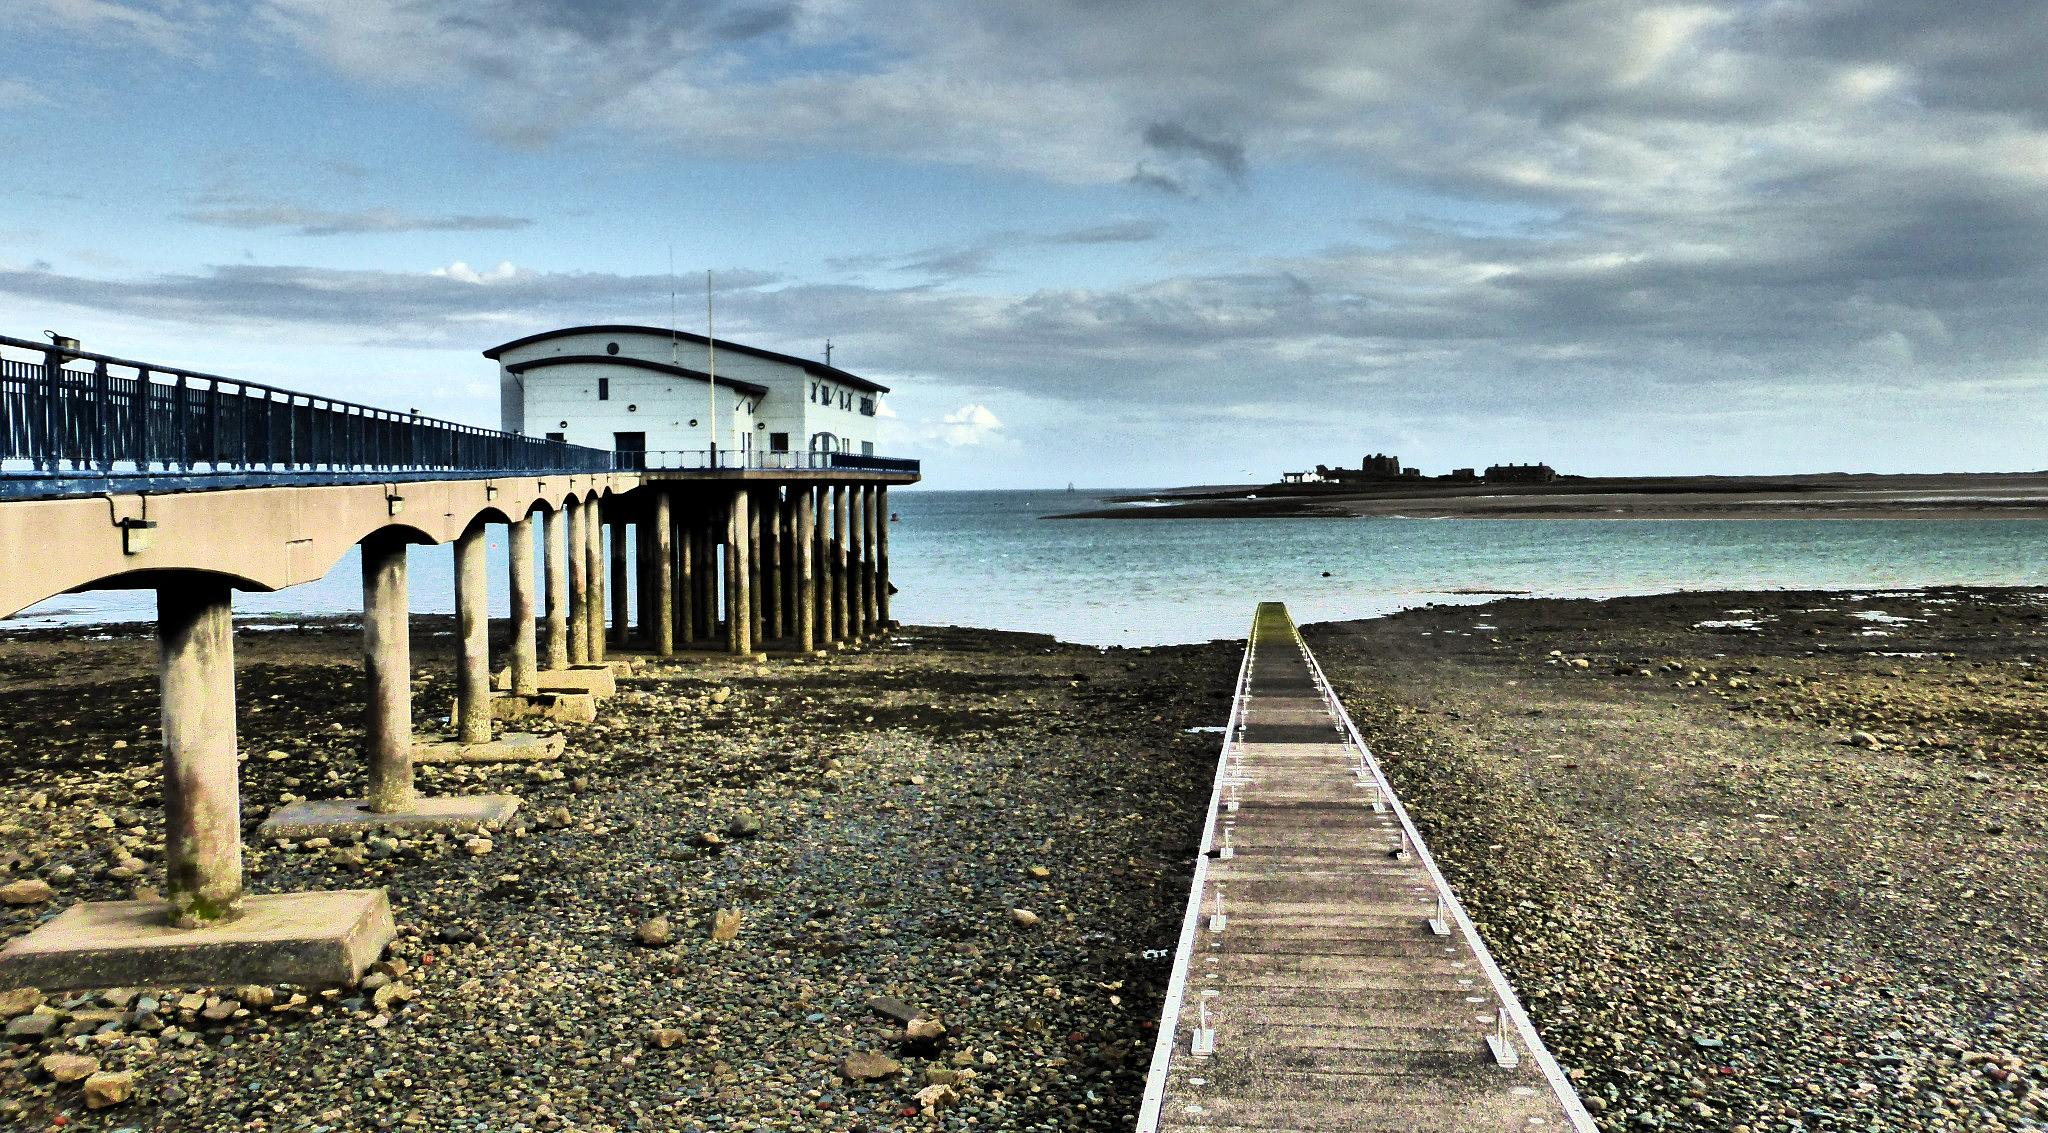 ISLAND LIFE by cheryl.ferrarkirkham